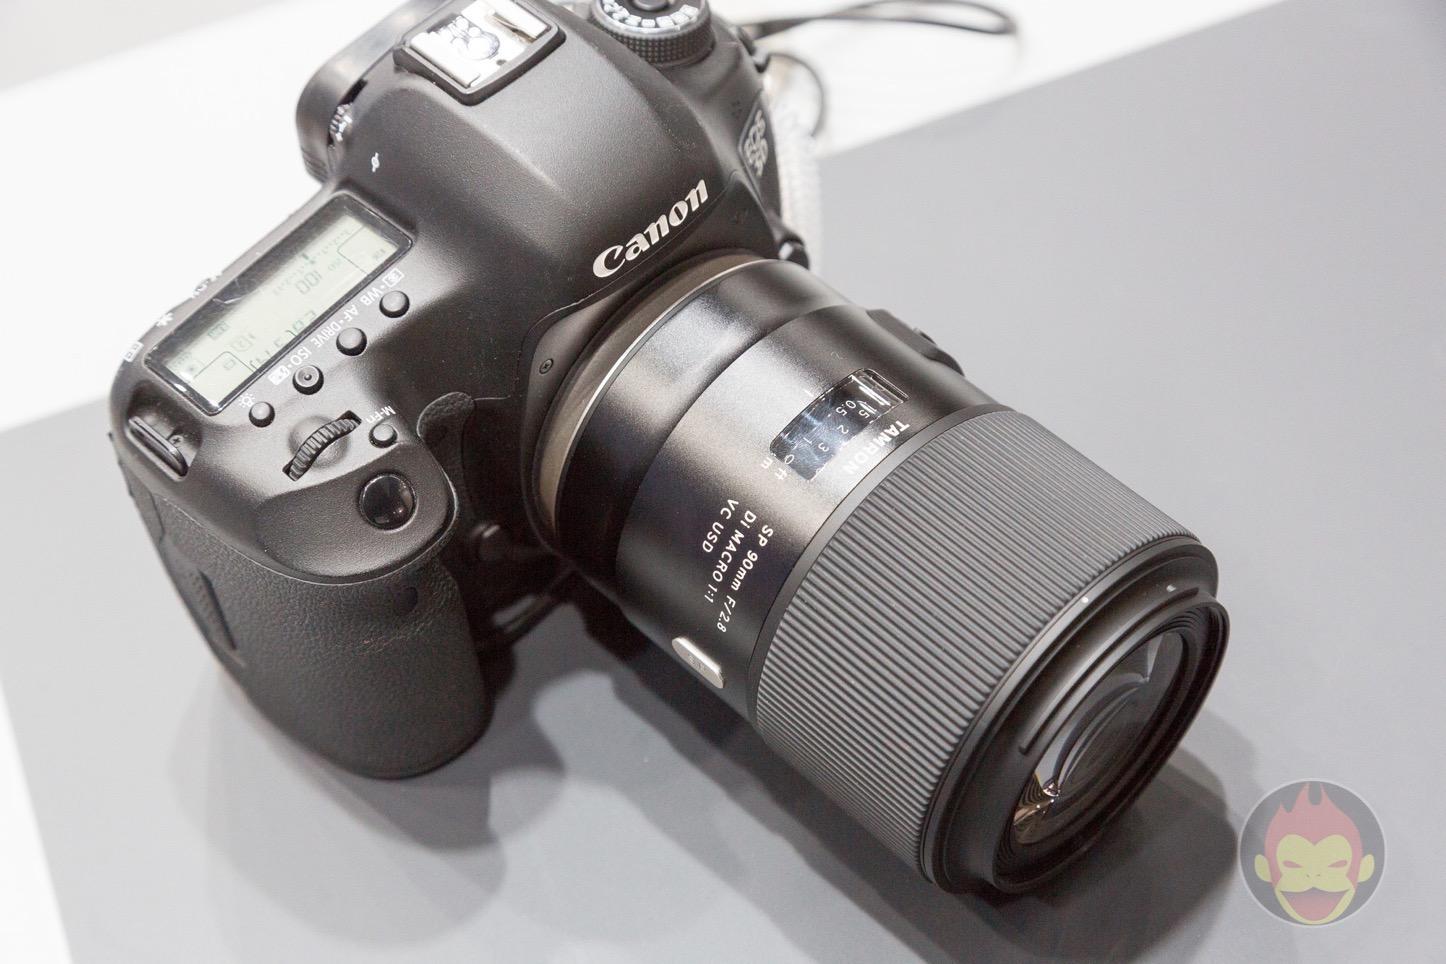 TAMRON SP 90mm MACRO 2.8 Di VC USD